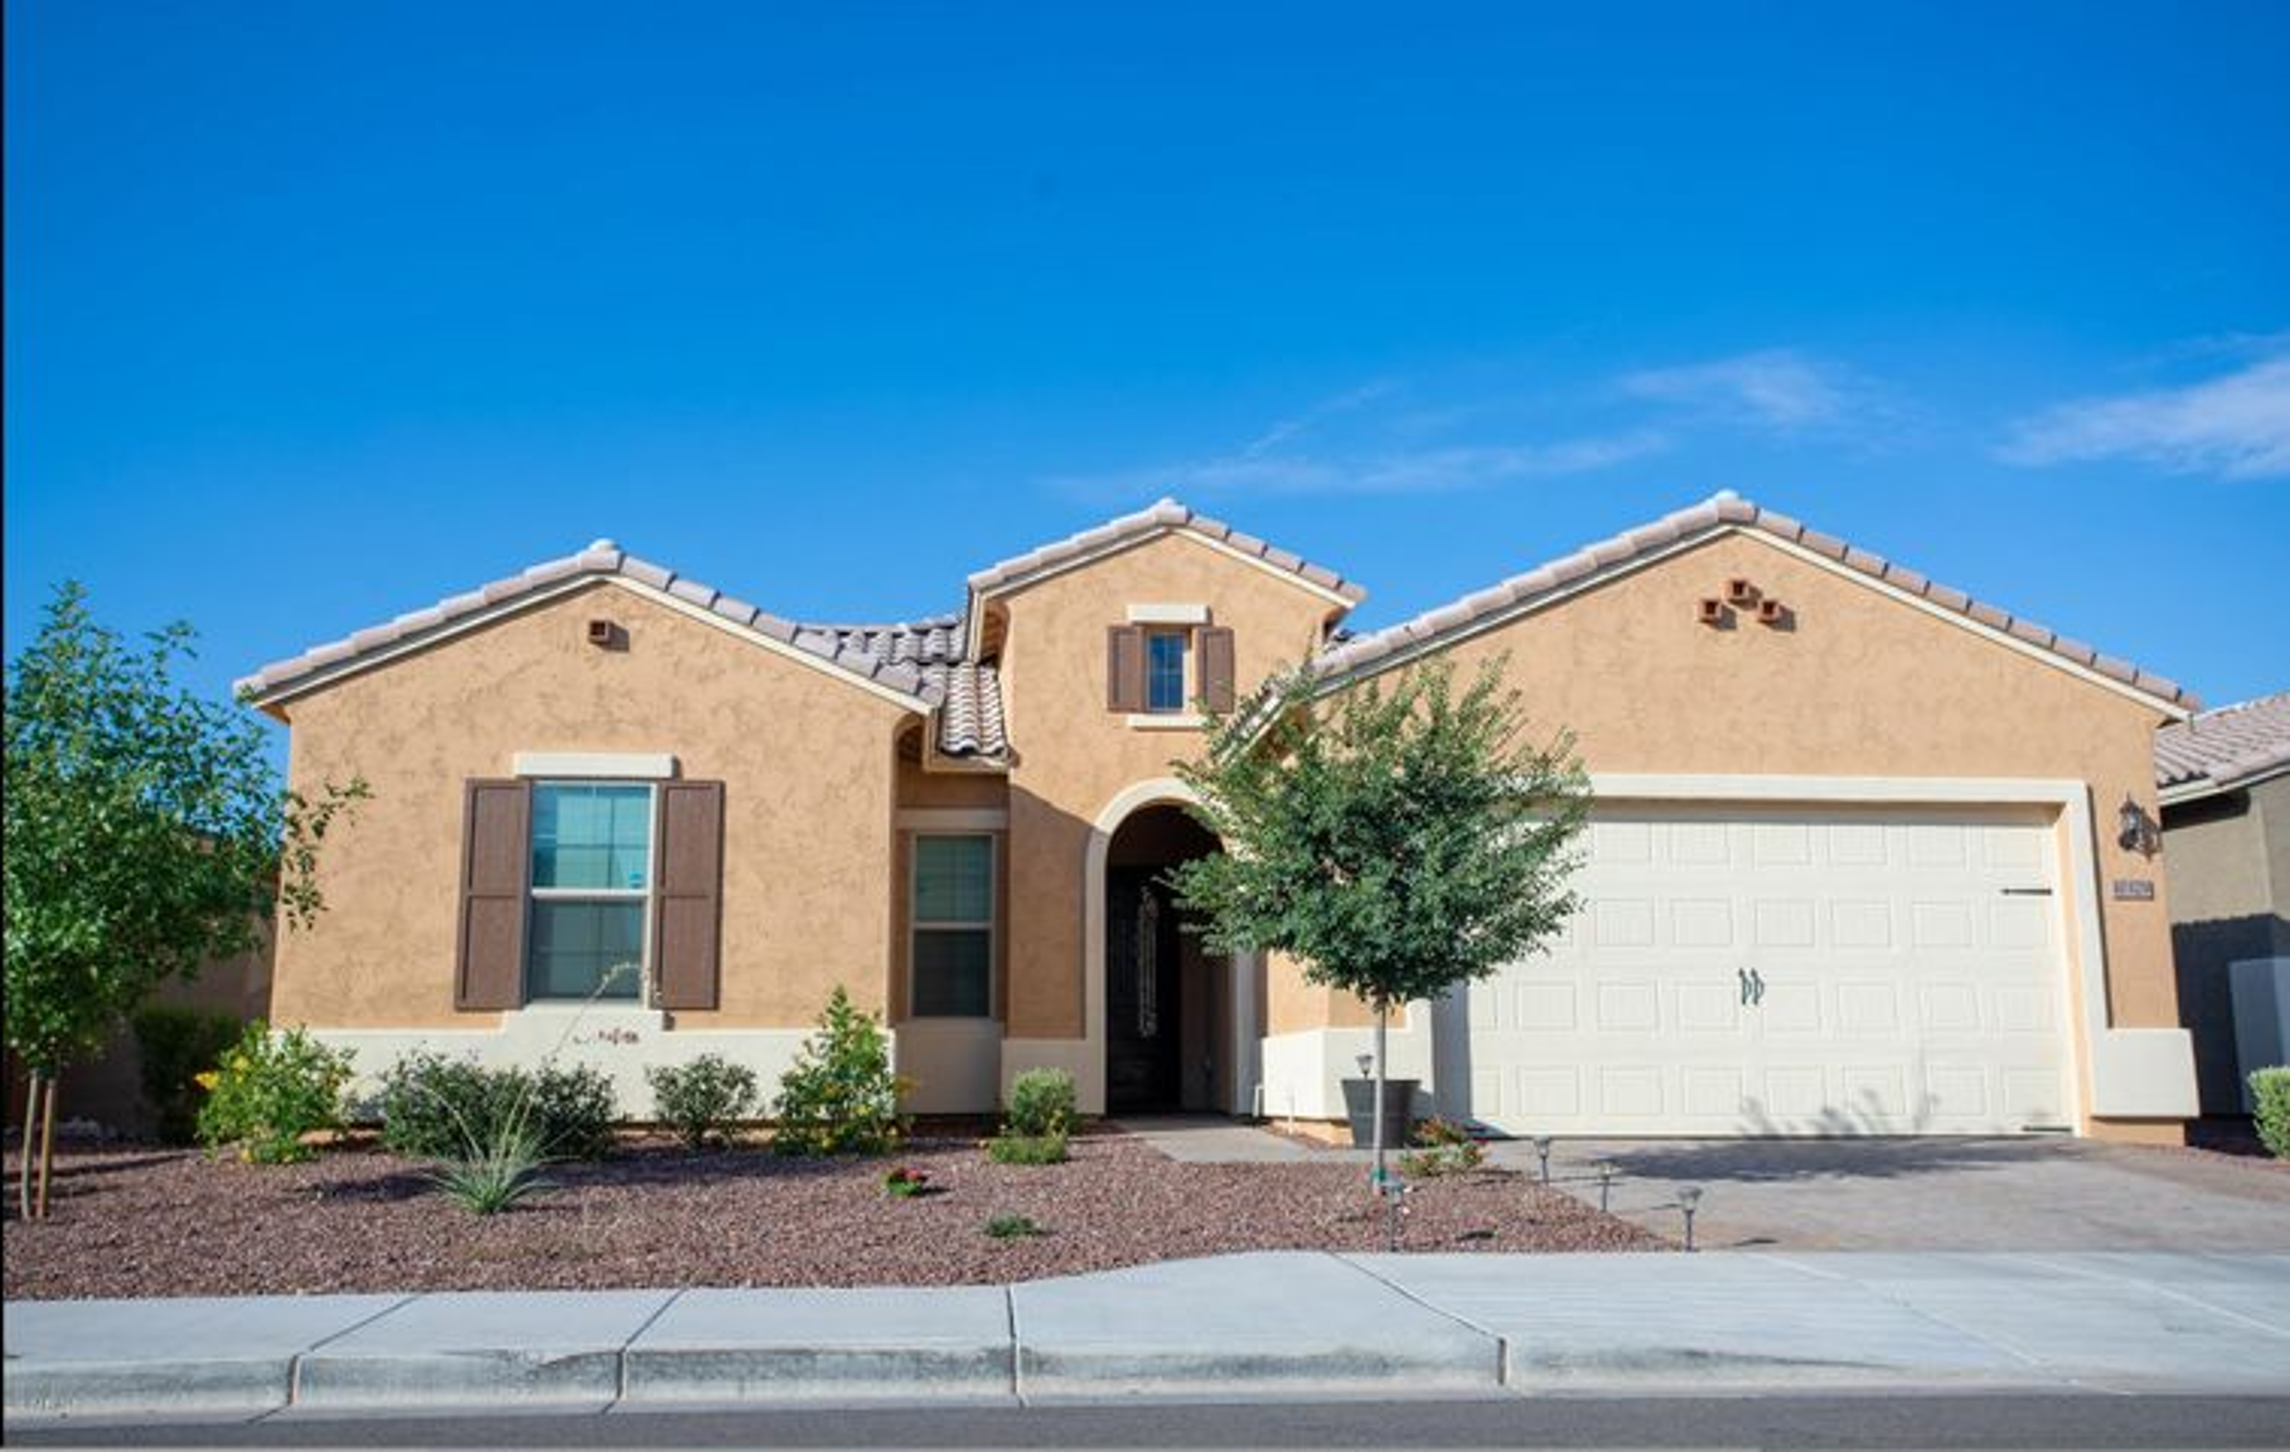 10329 W FETLOCK Trail, Peoria, AZ 85383